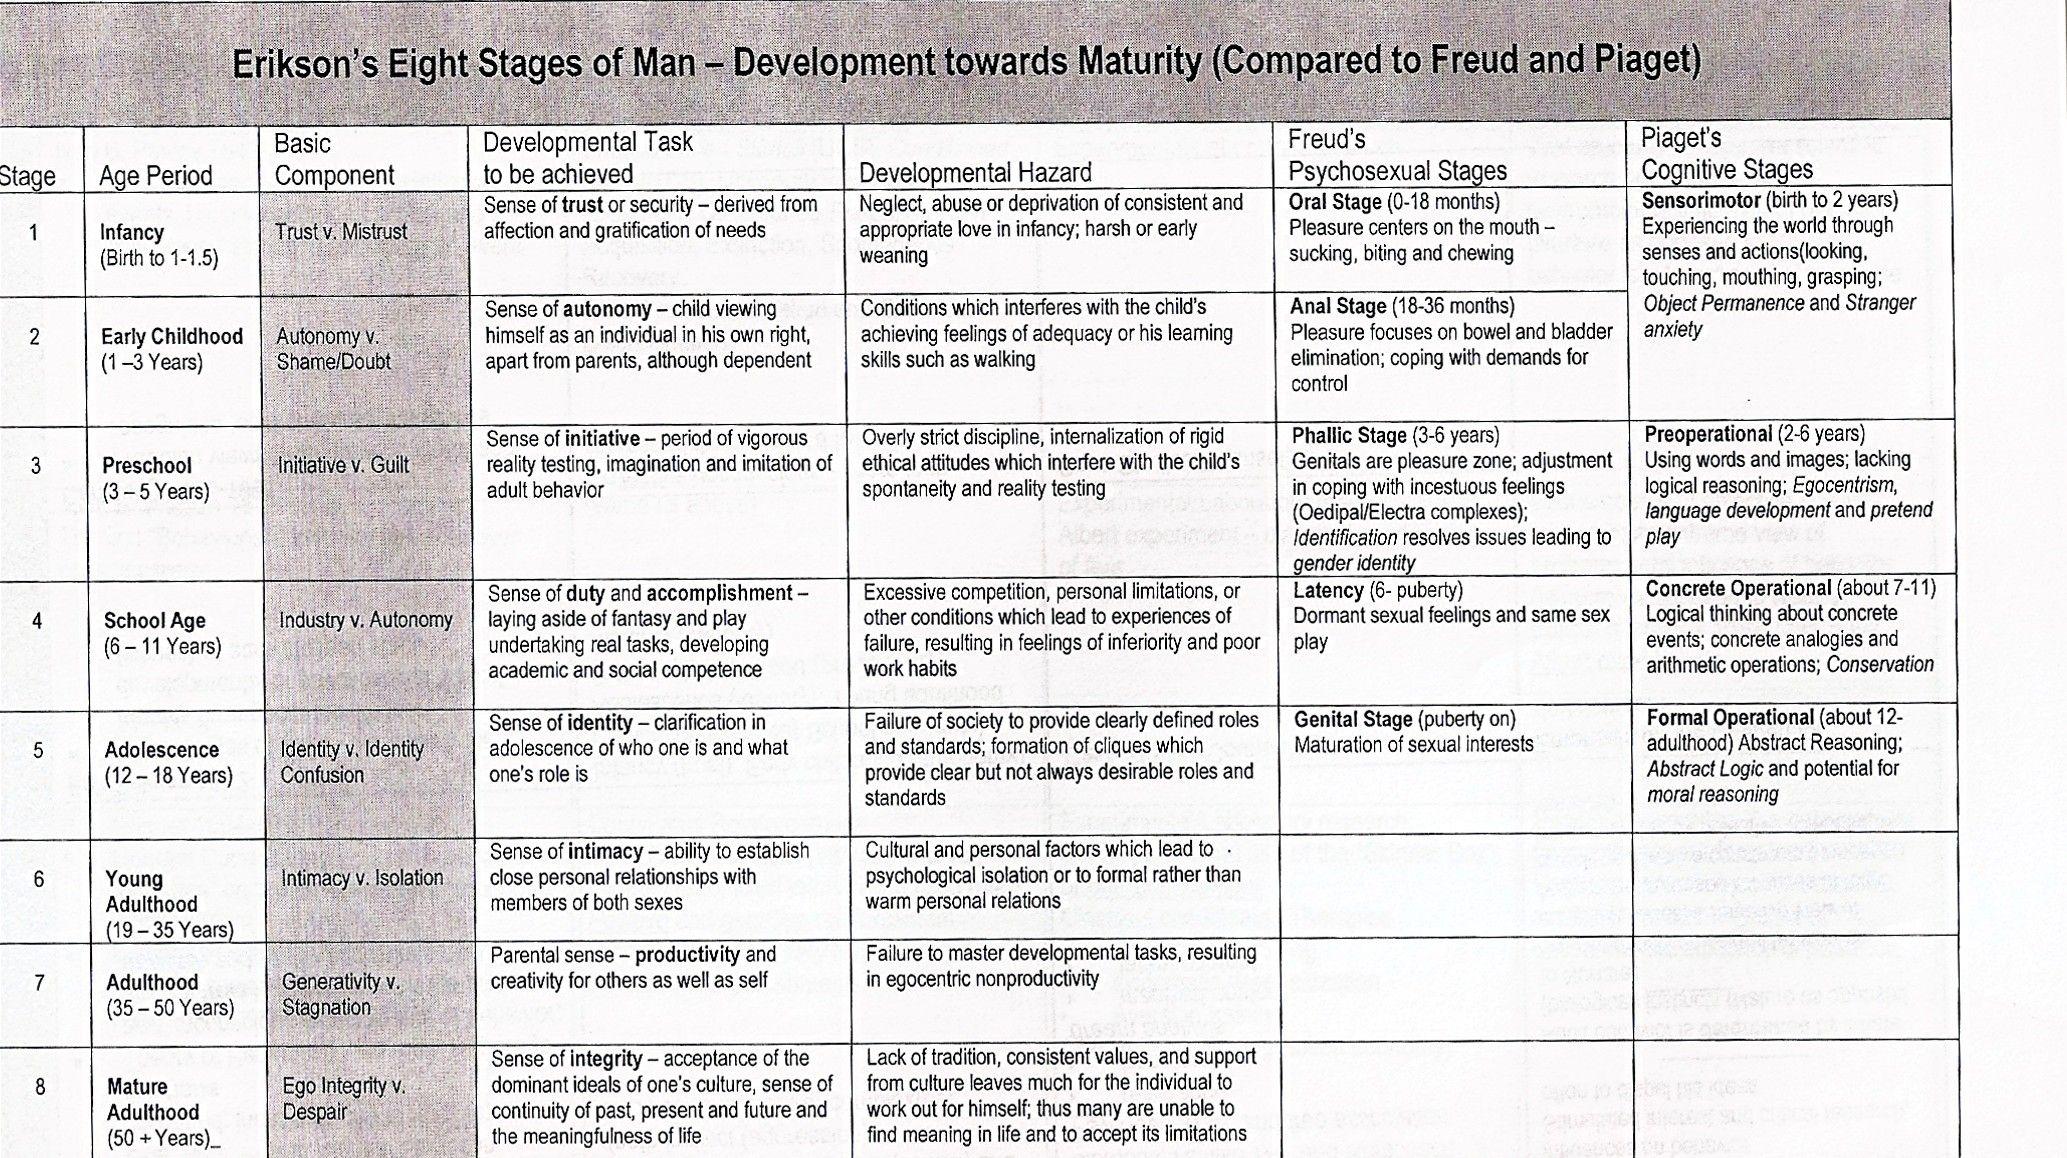 freuds developmental stages